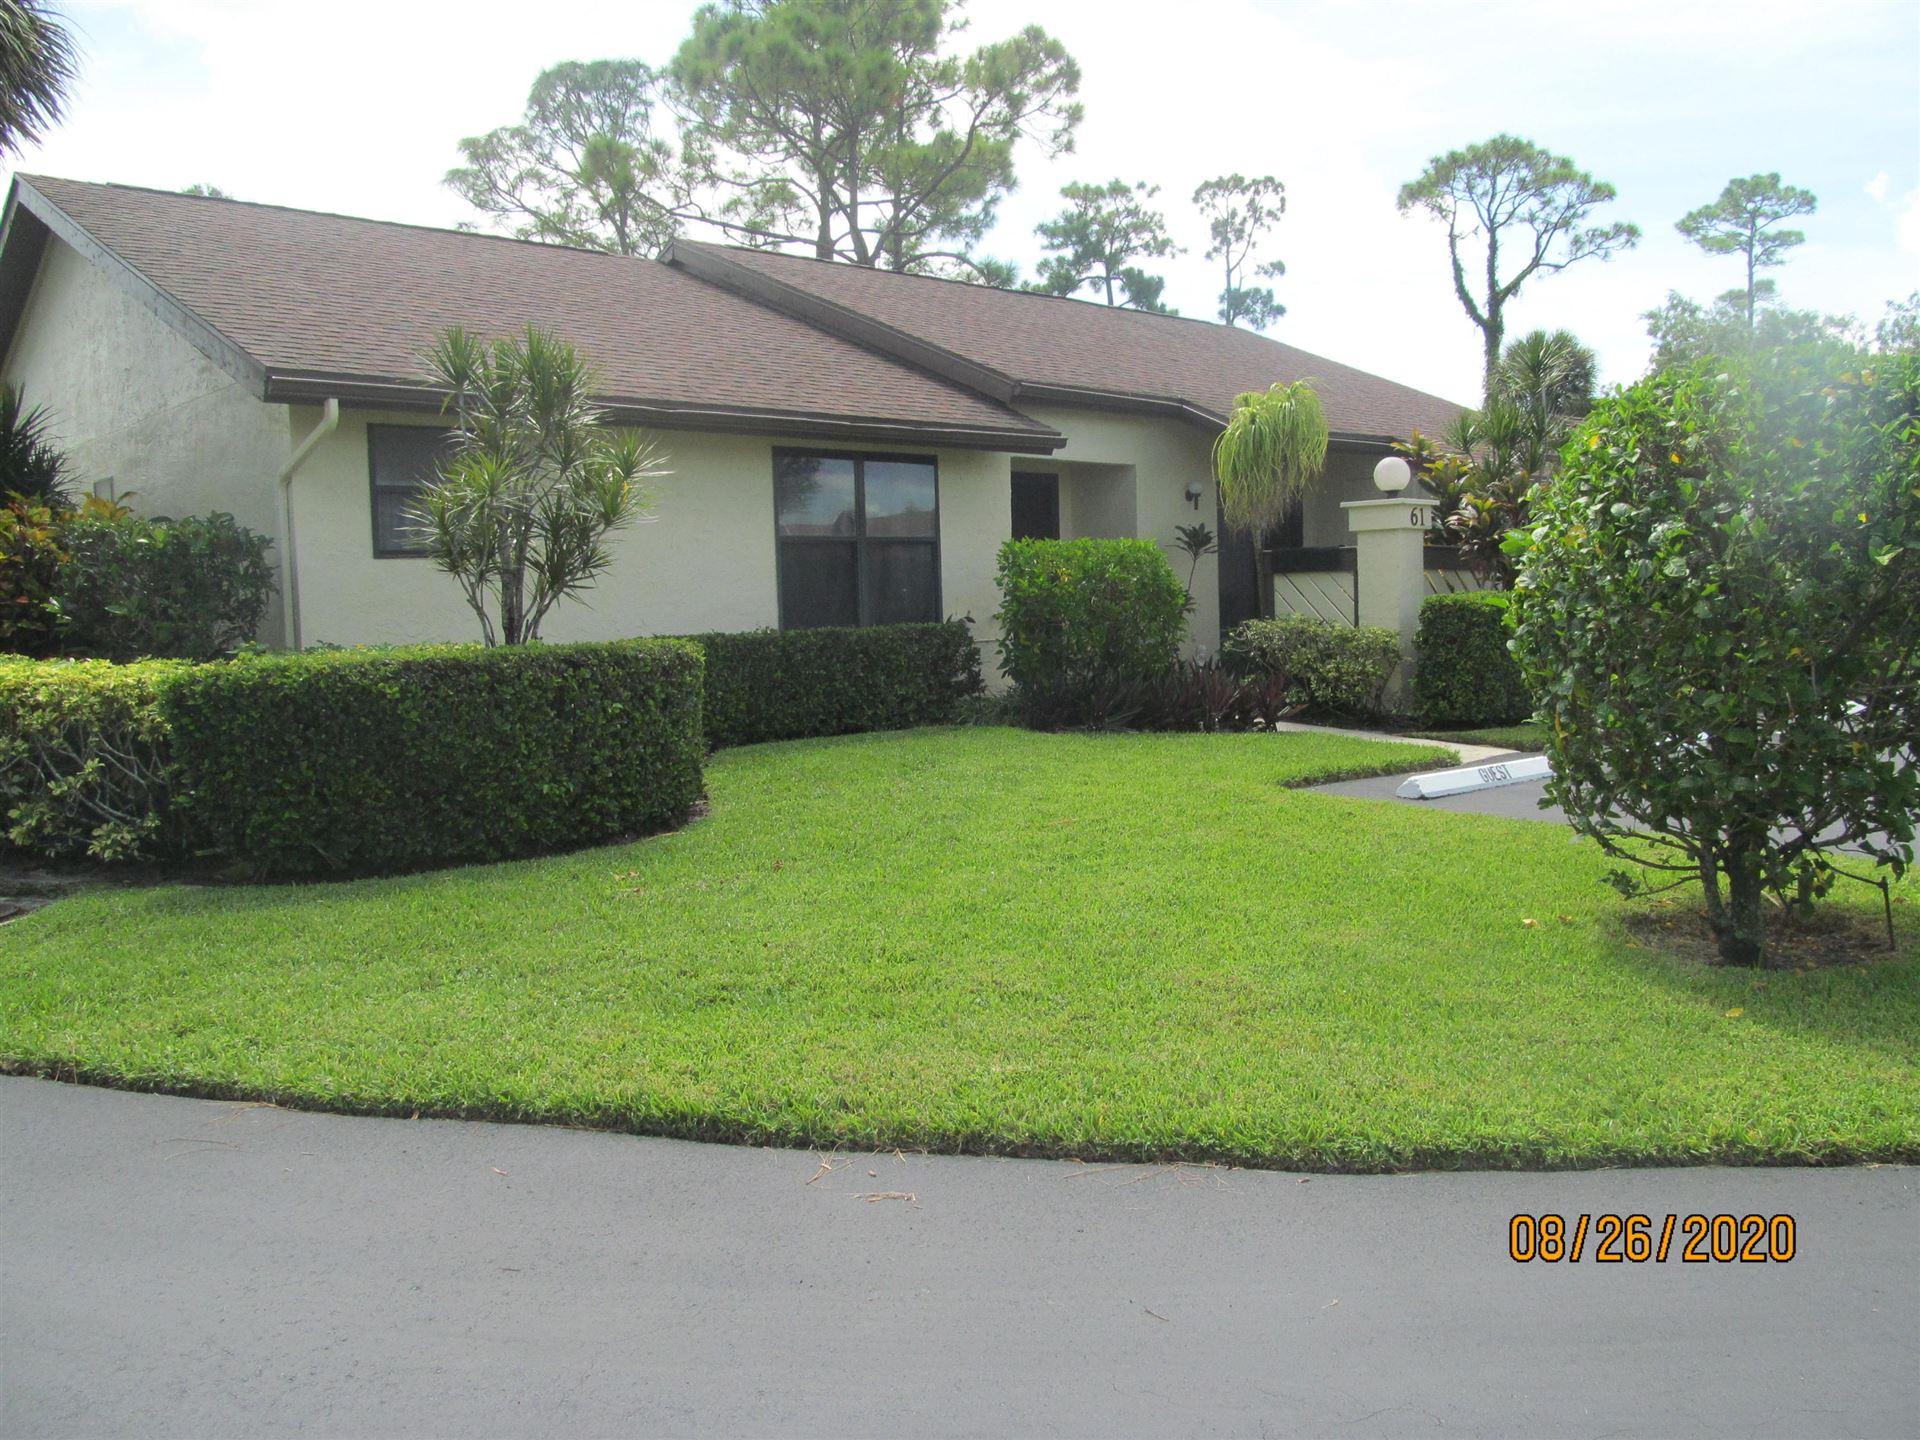 61 Macadamia Court, Royal Palm Beach, FL 33411 - #: RX-10650316